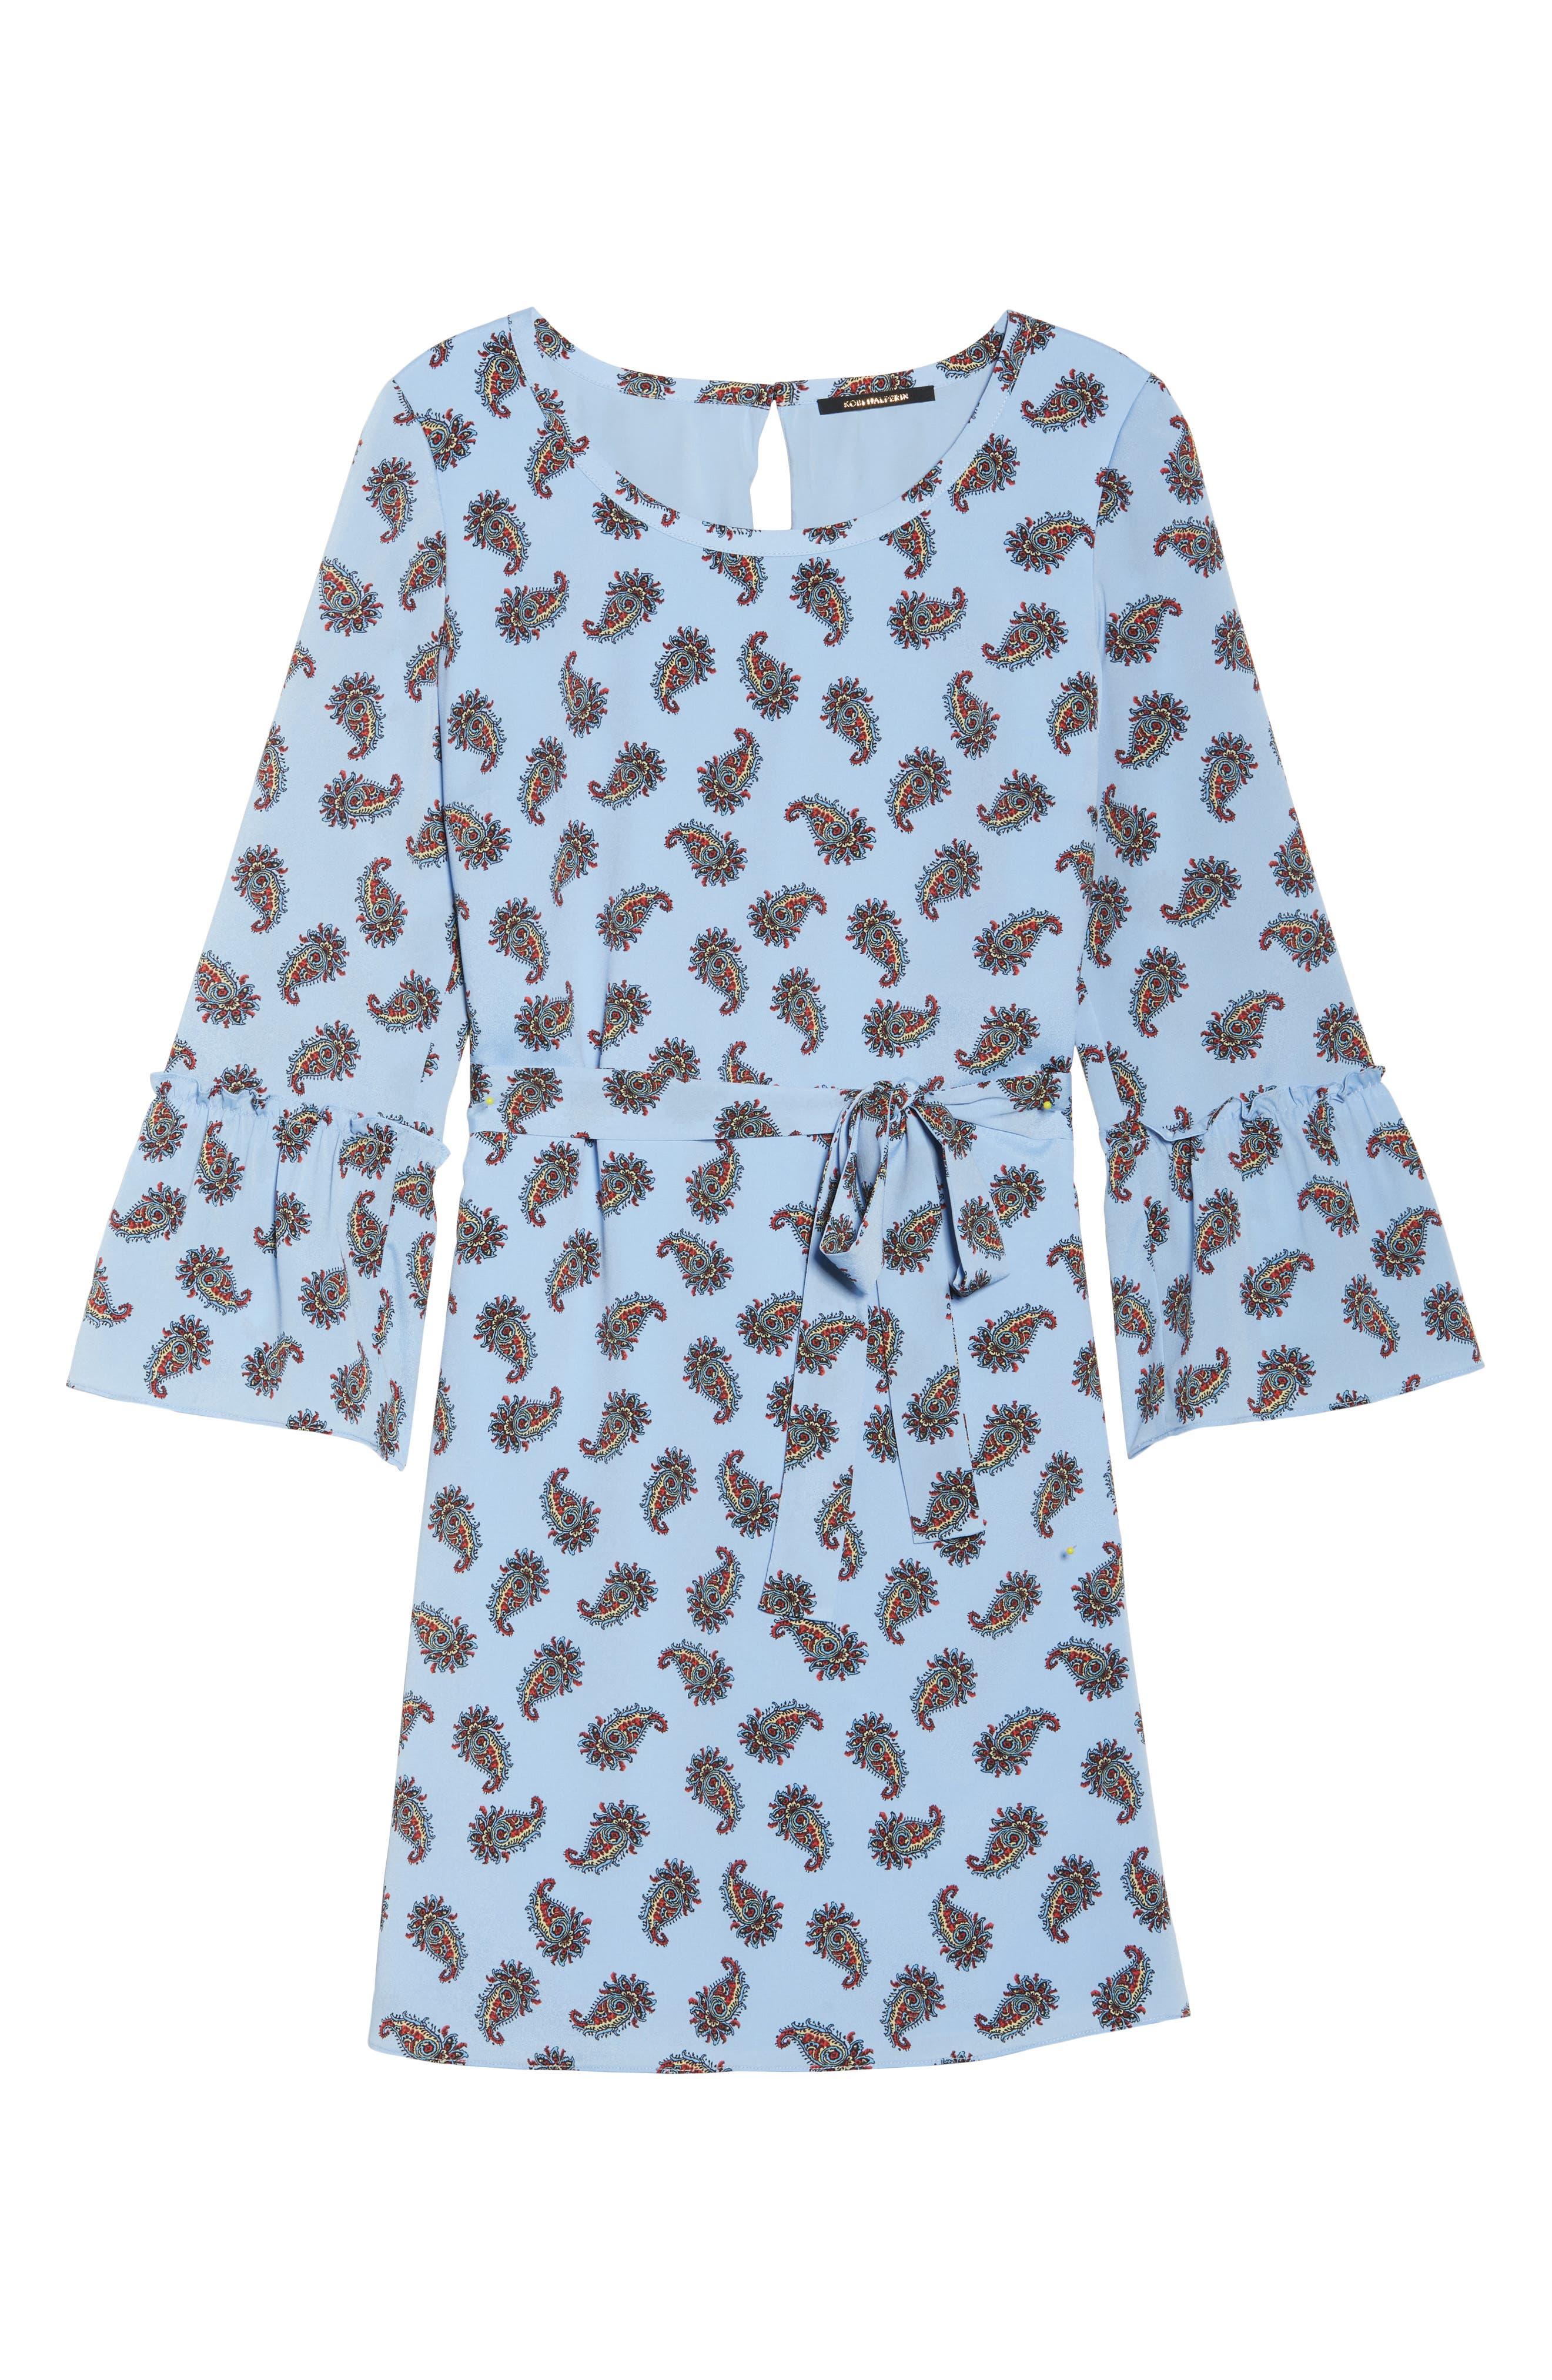 Orli Paisley Print Bell Sleeve Dress,                             Alternate thumbnail 6, color,                             Blue Multi